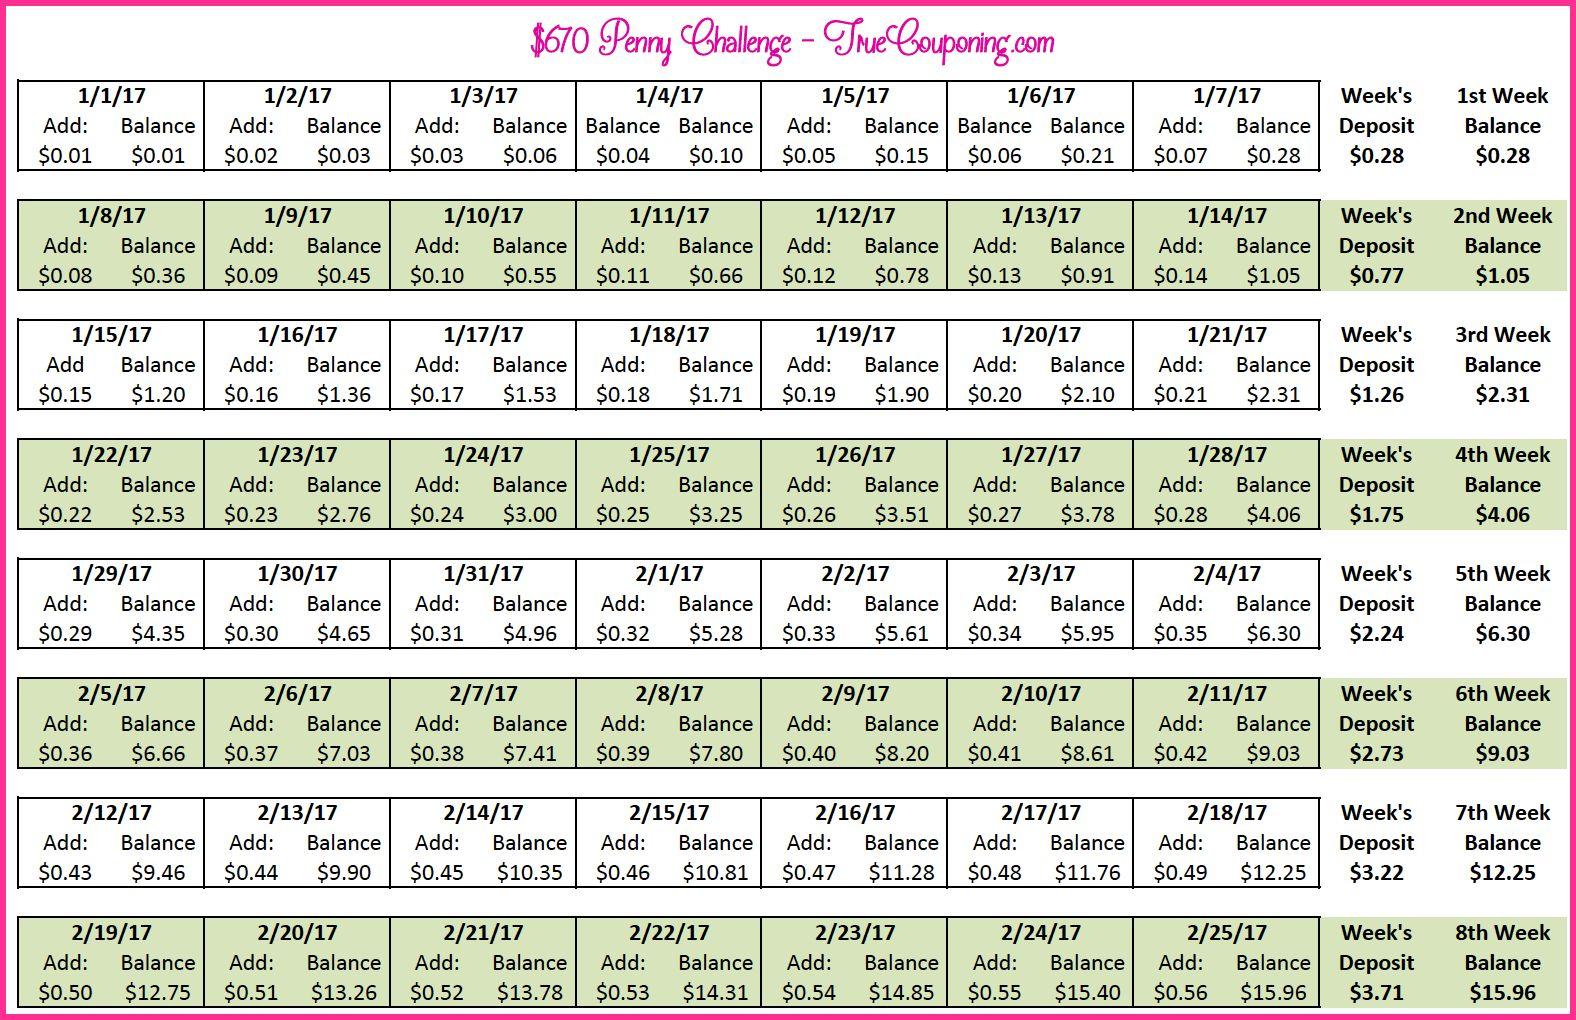 $670 Penny Challenge Sheet 2017